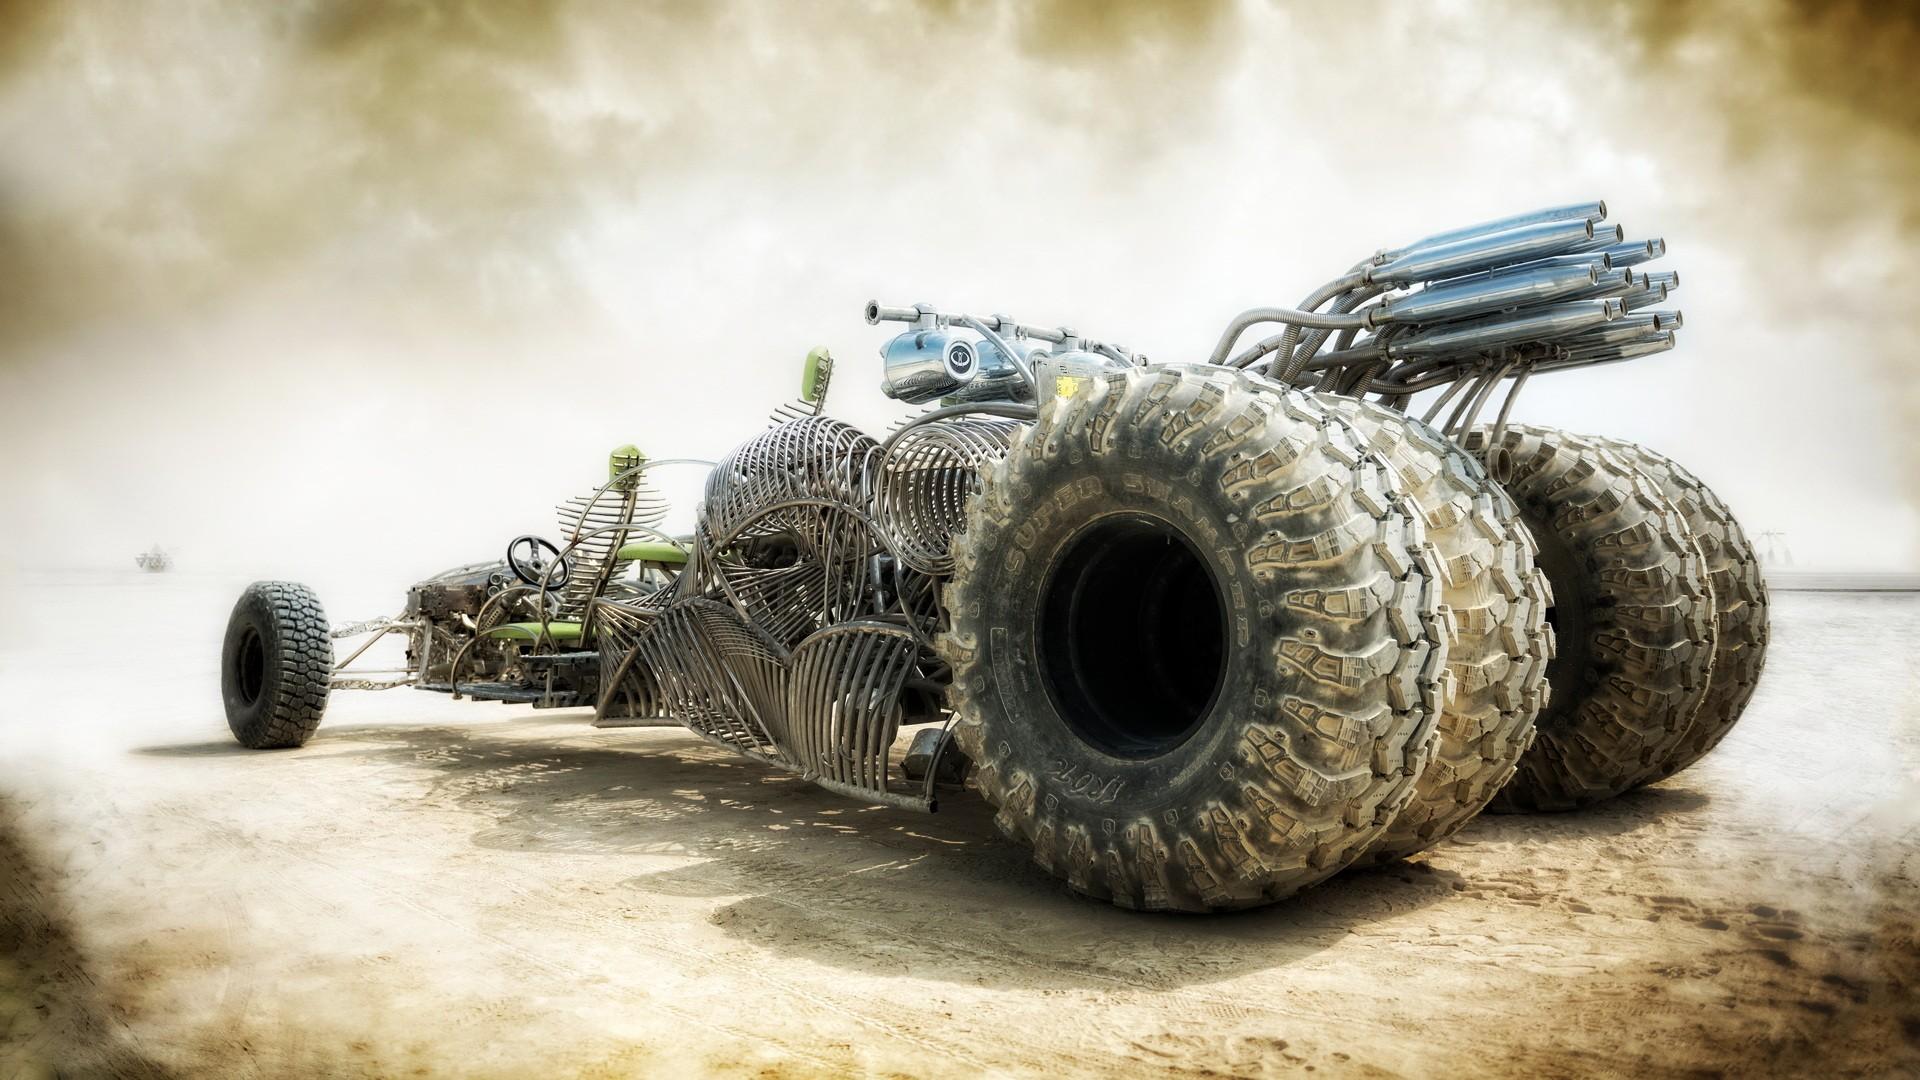 General 1920x1080 car Mad Max: Fury Road movies vehicle